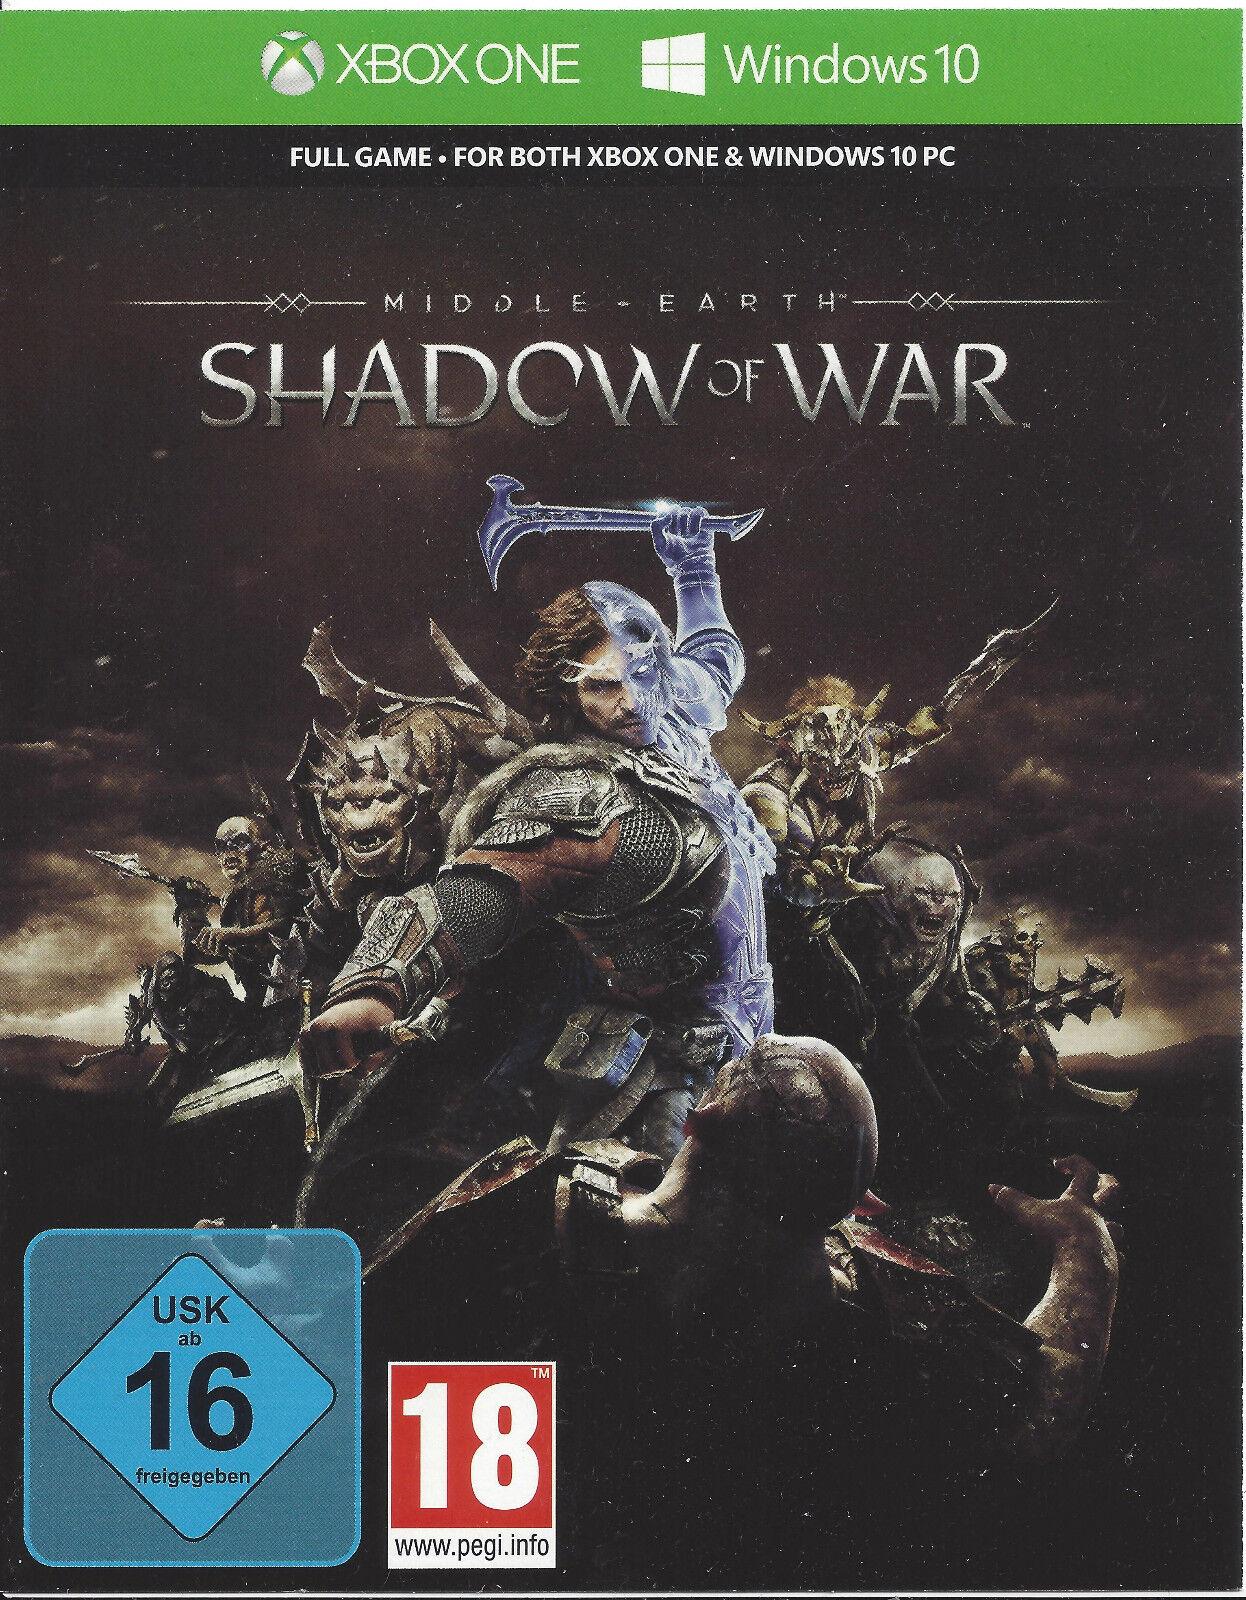 Xbox One Mittelerde Schatten des Krieges Key, Live Shadow of War Download Code